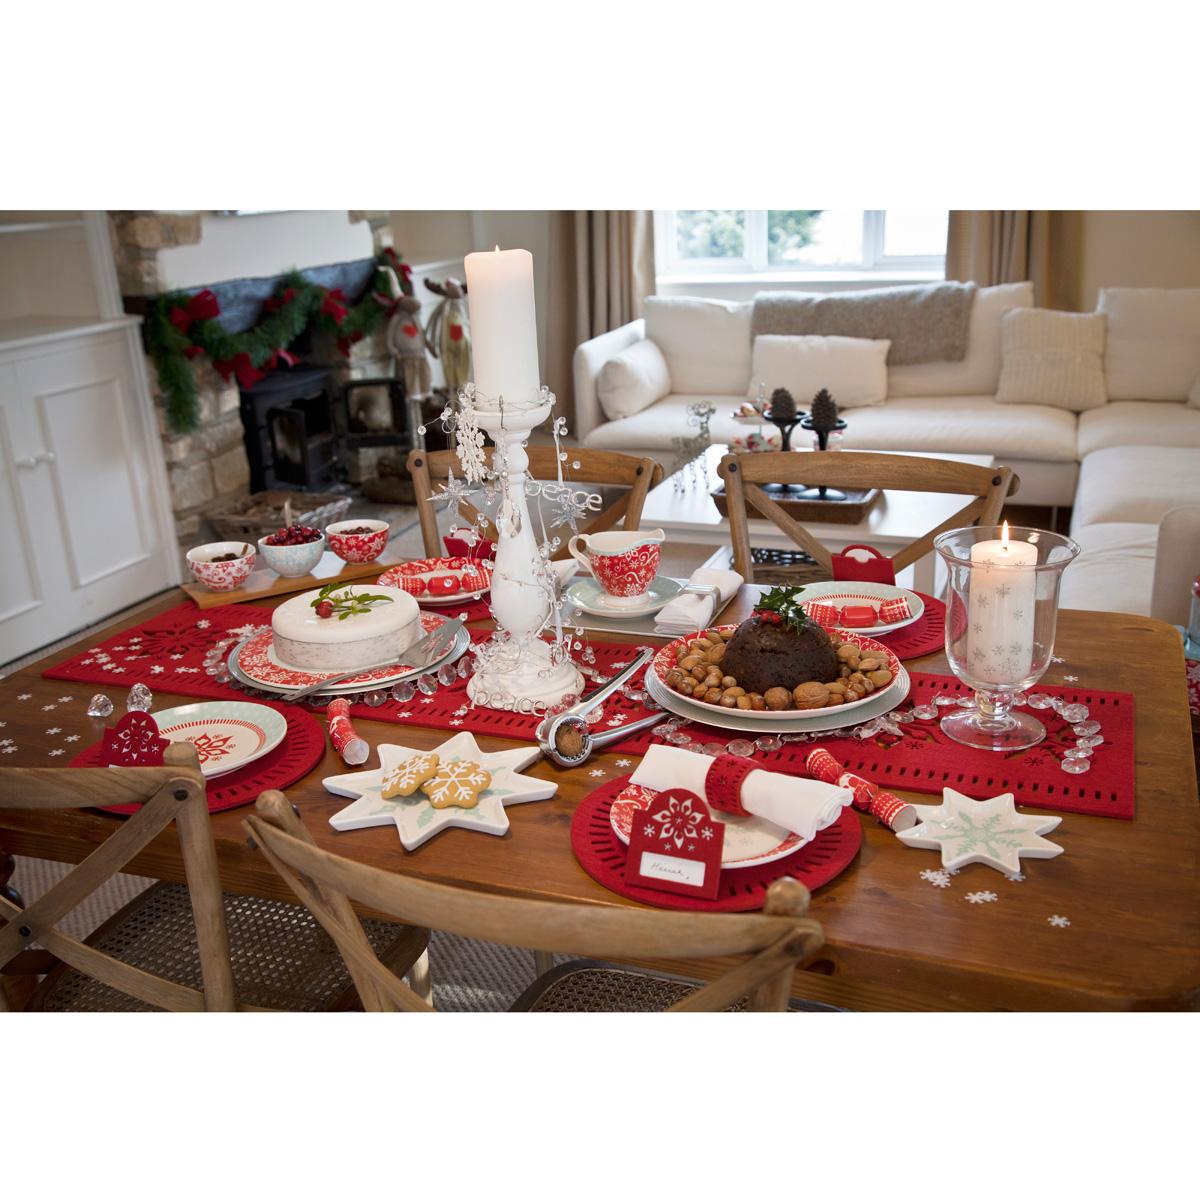 5 Piece Set Of Christmas Dinner Tableware Unique Home Living